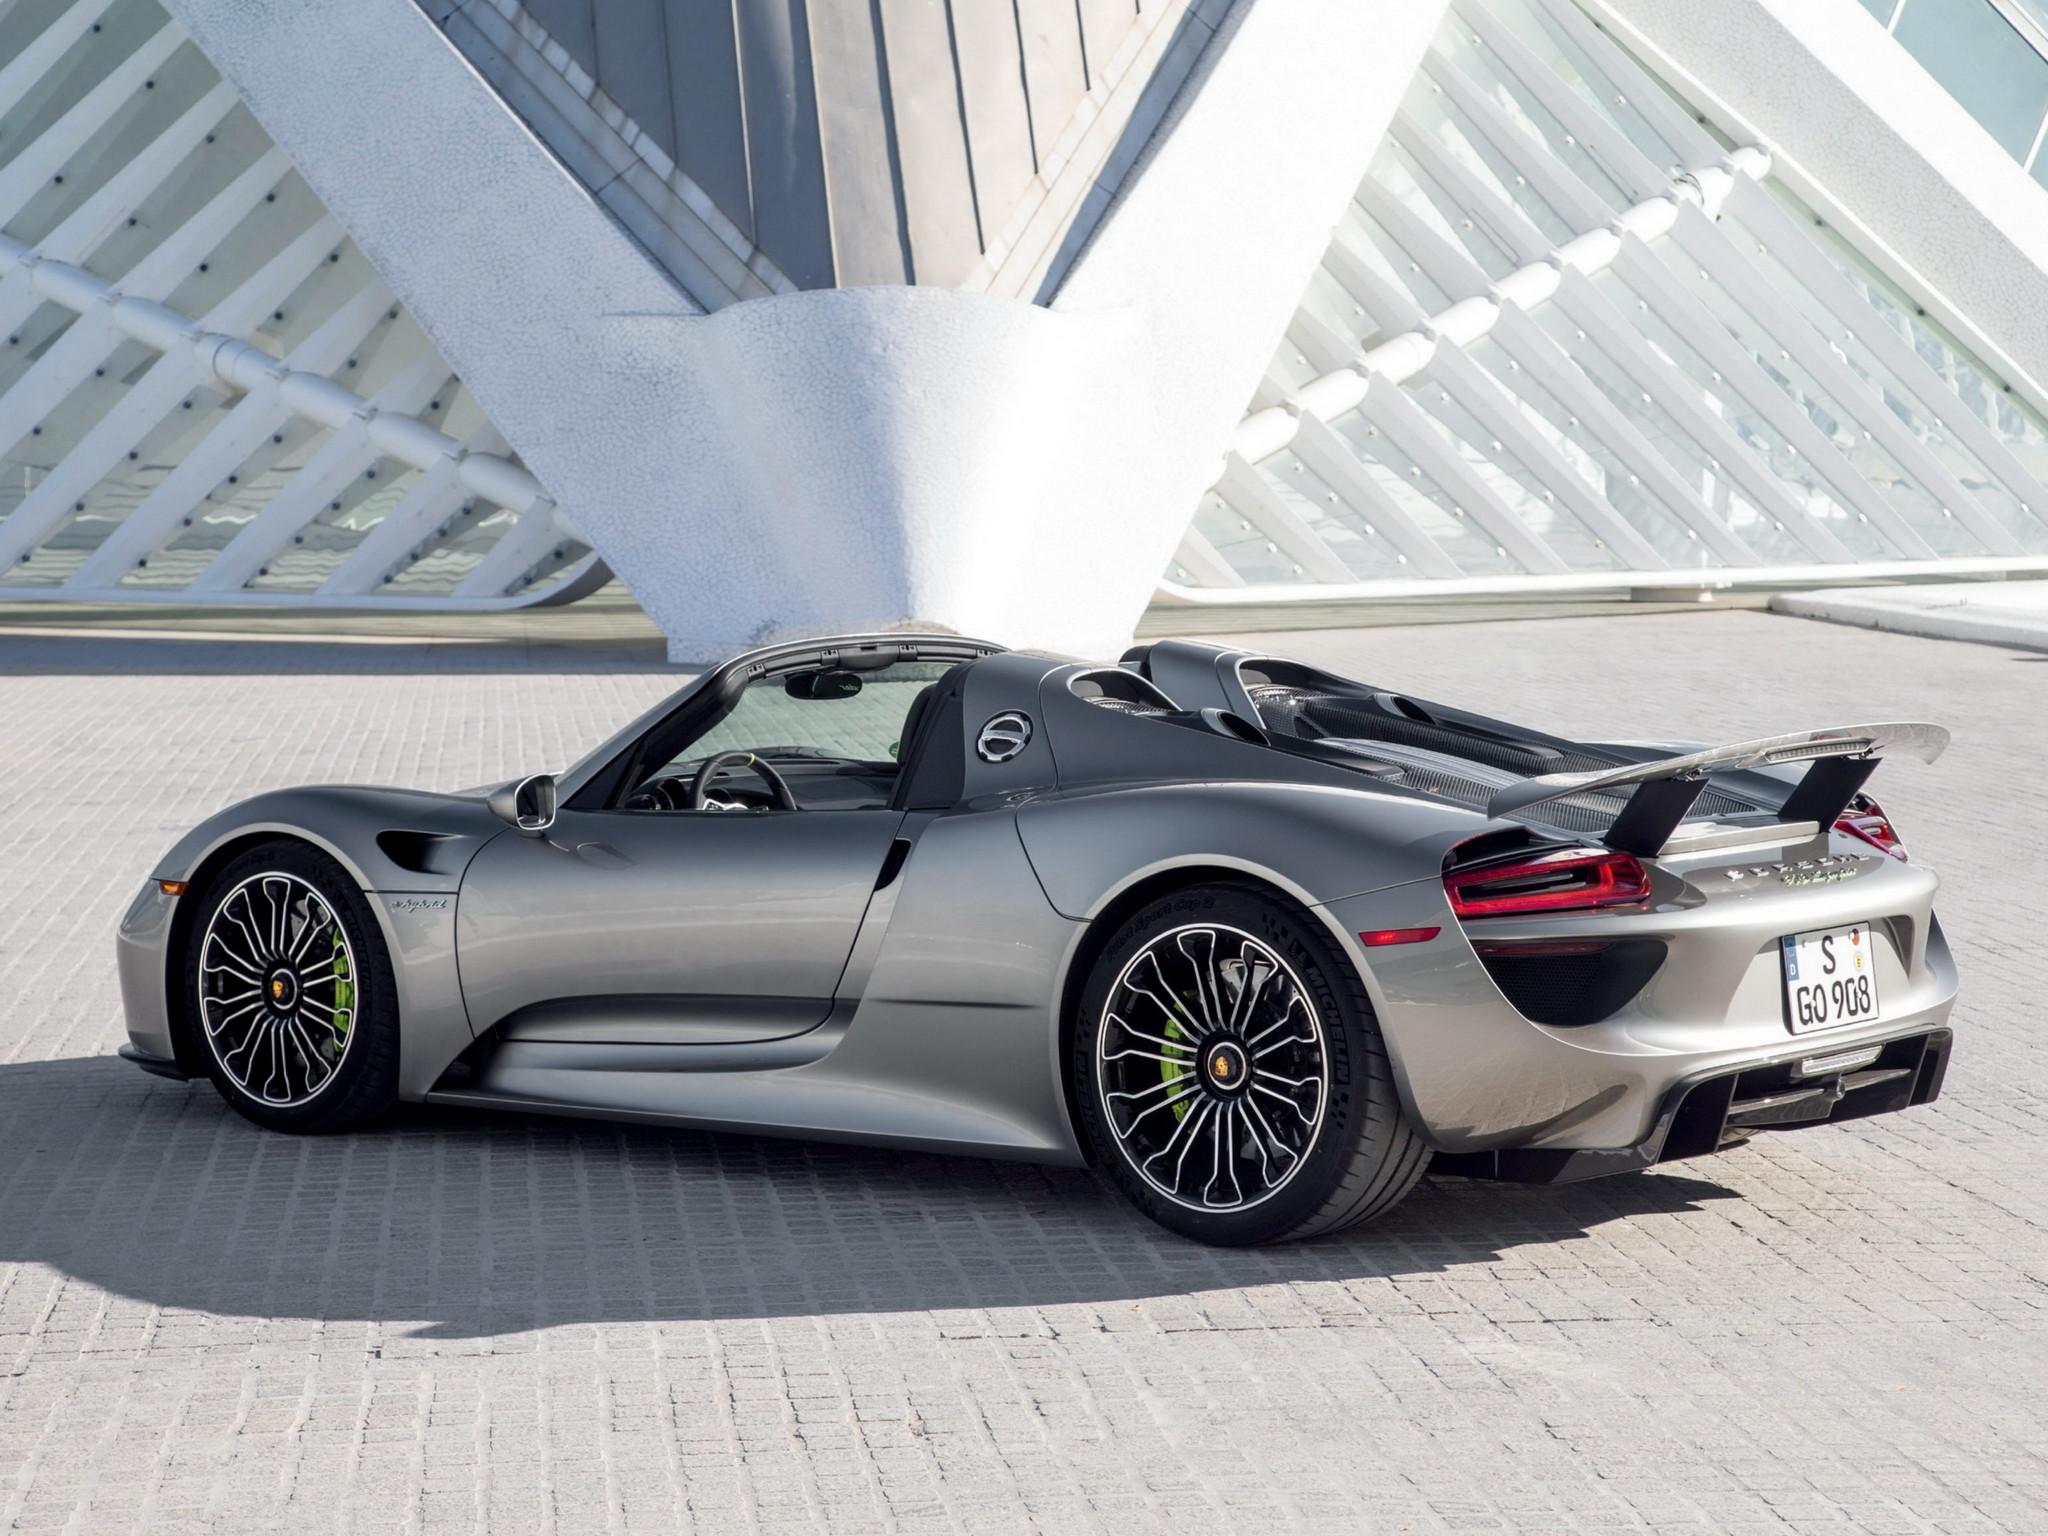 Amazing Porsche 918 Back Fire Abstract Car 2014